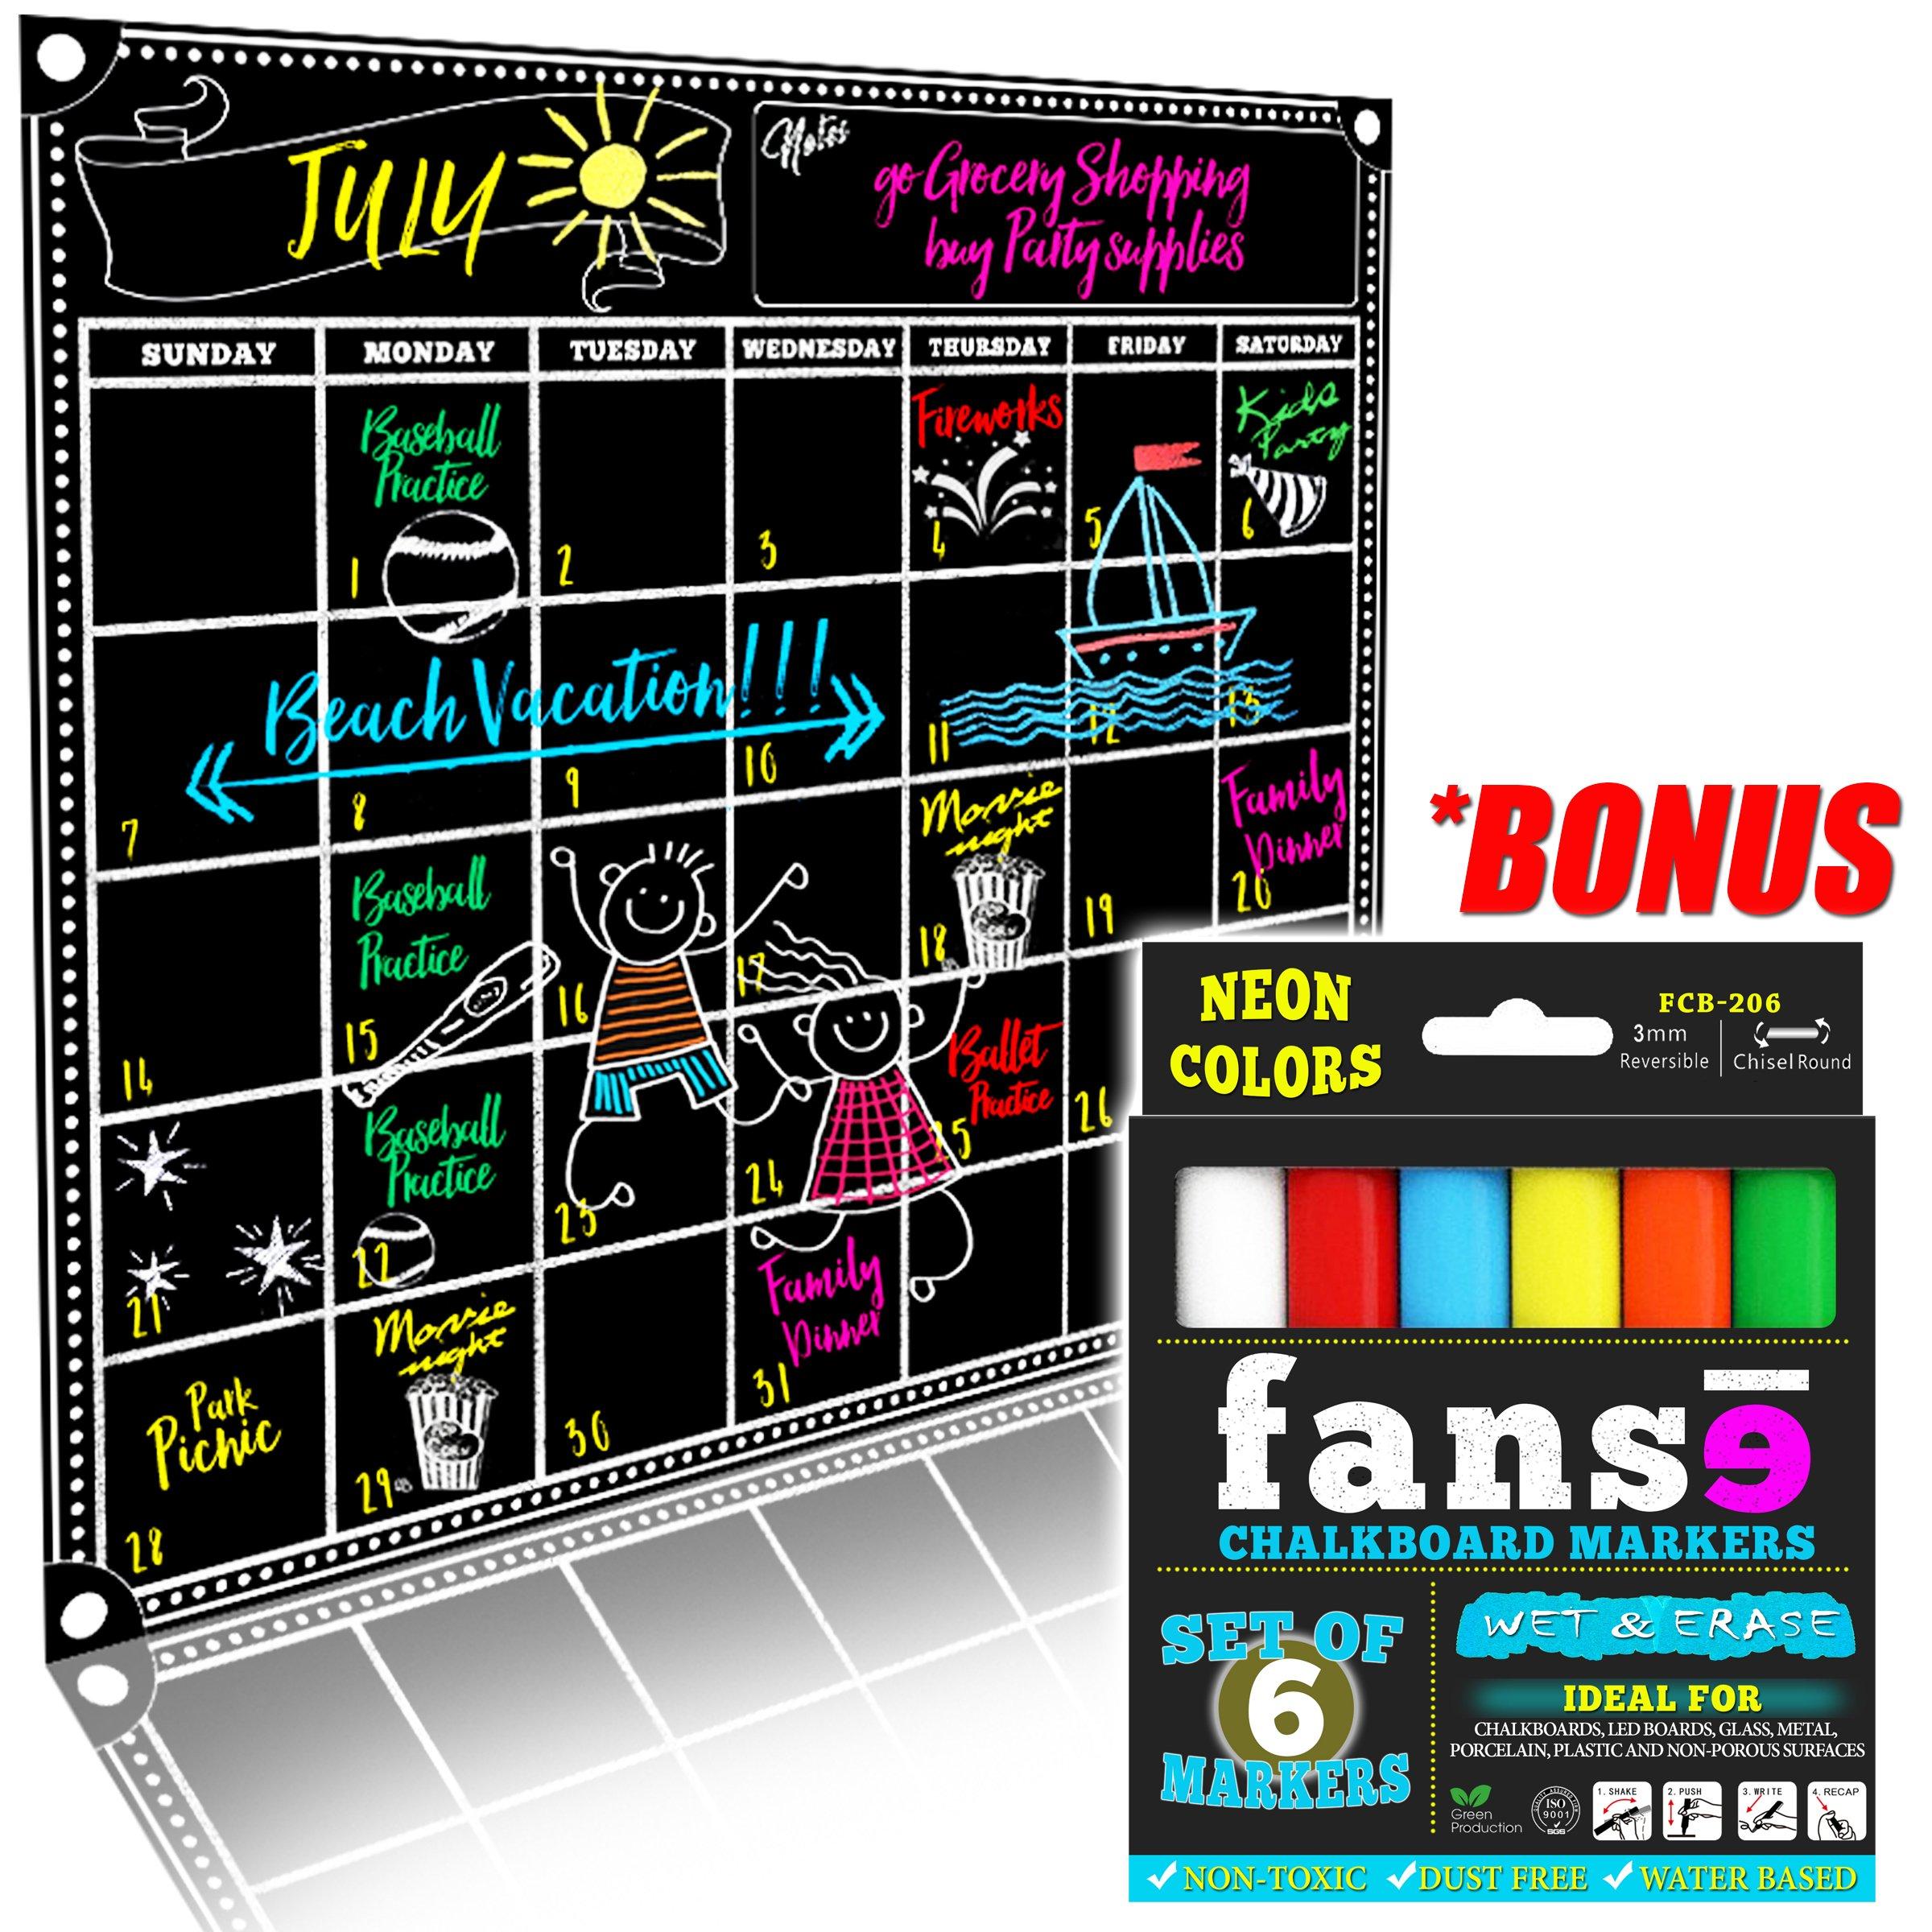 Fanse Large Magnetic Chalkboard Calendar and Liquid Chalk Marker Set 18'' x 14'' / Monthly Planner Blackboard Organizer Agenda Memo for Home, Grocery, Kitchen Refrigerator, Classroom, Dorm Room